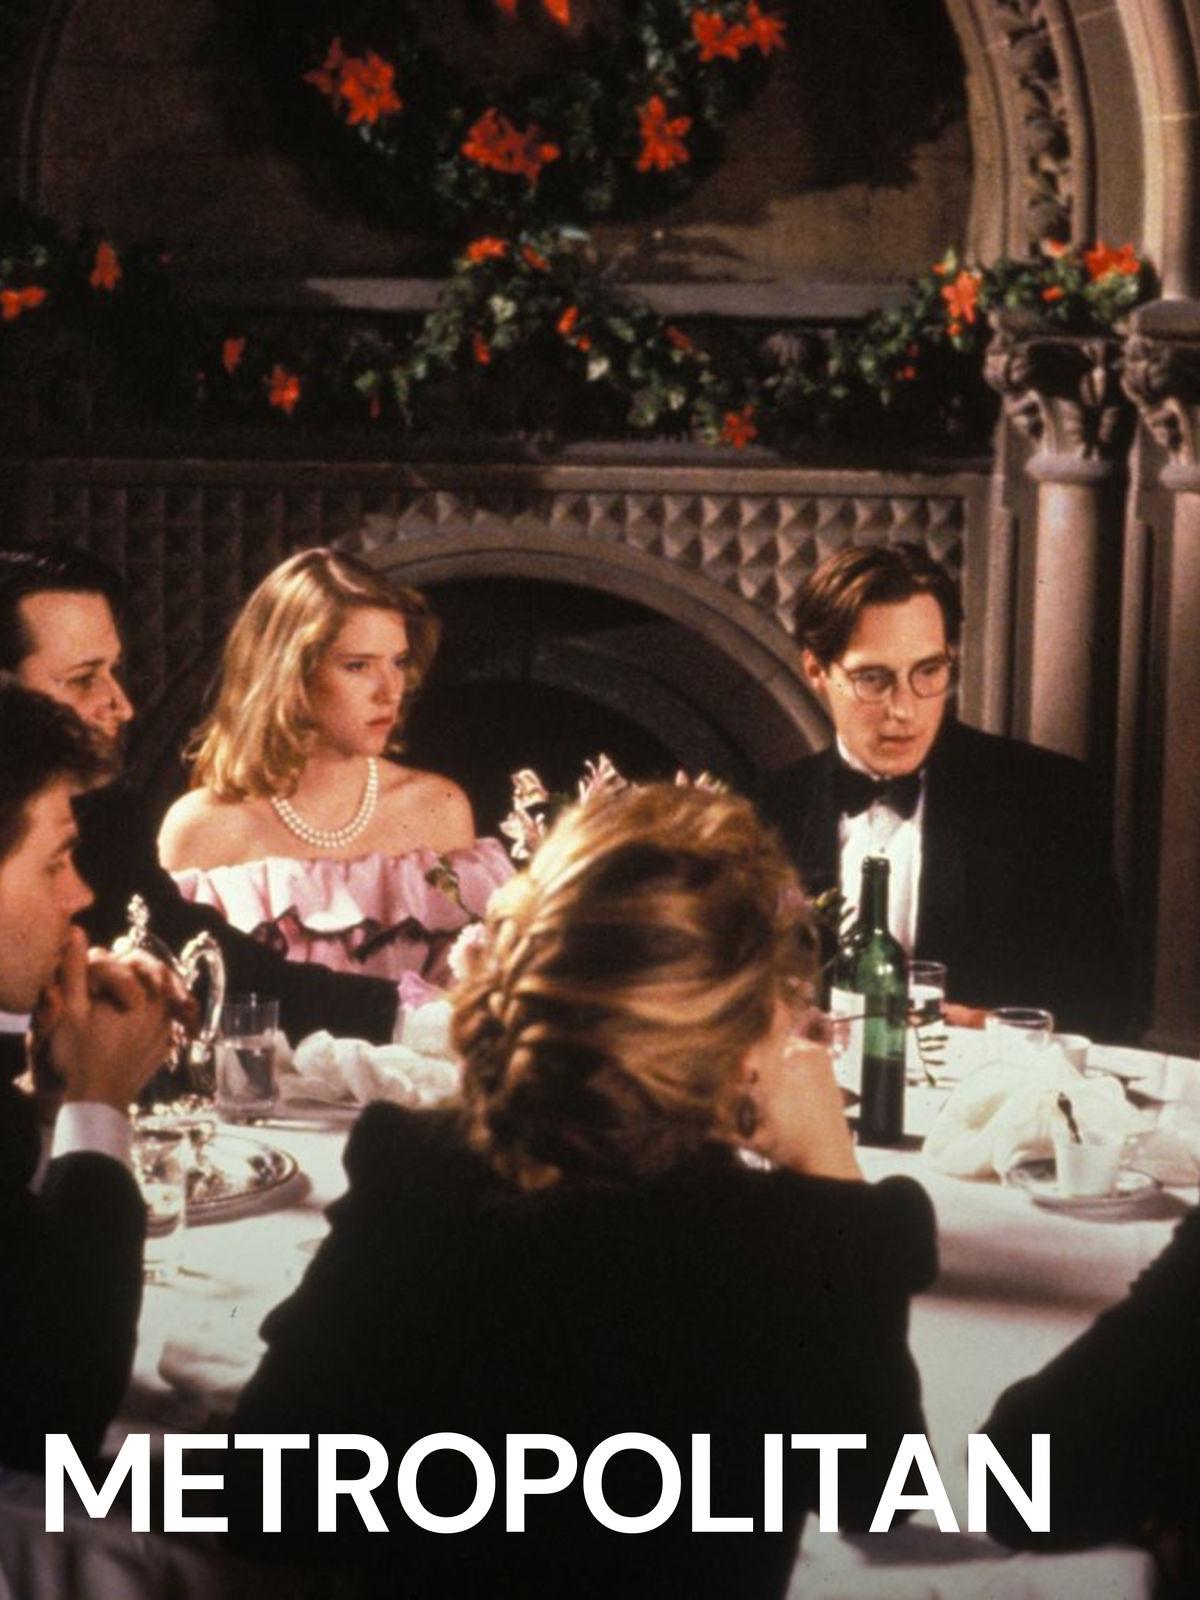 Donal Lardner Ward Best Movies, TV Shows and Web Series List